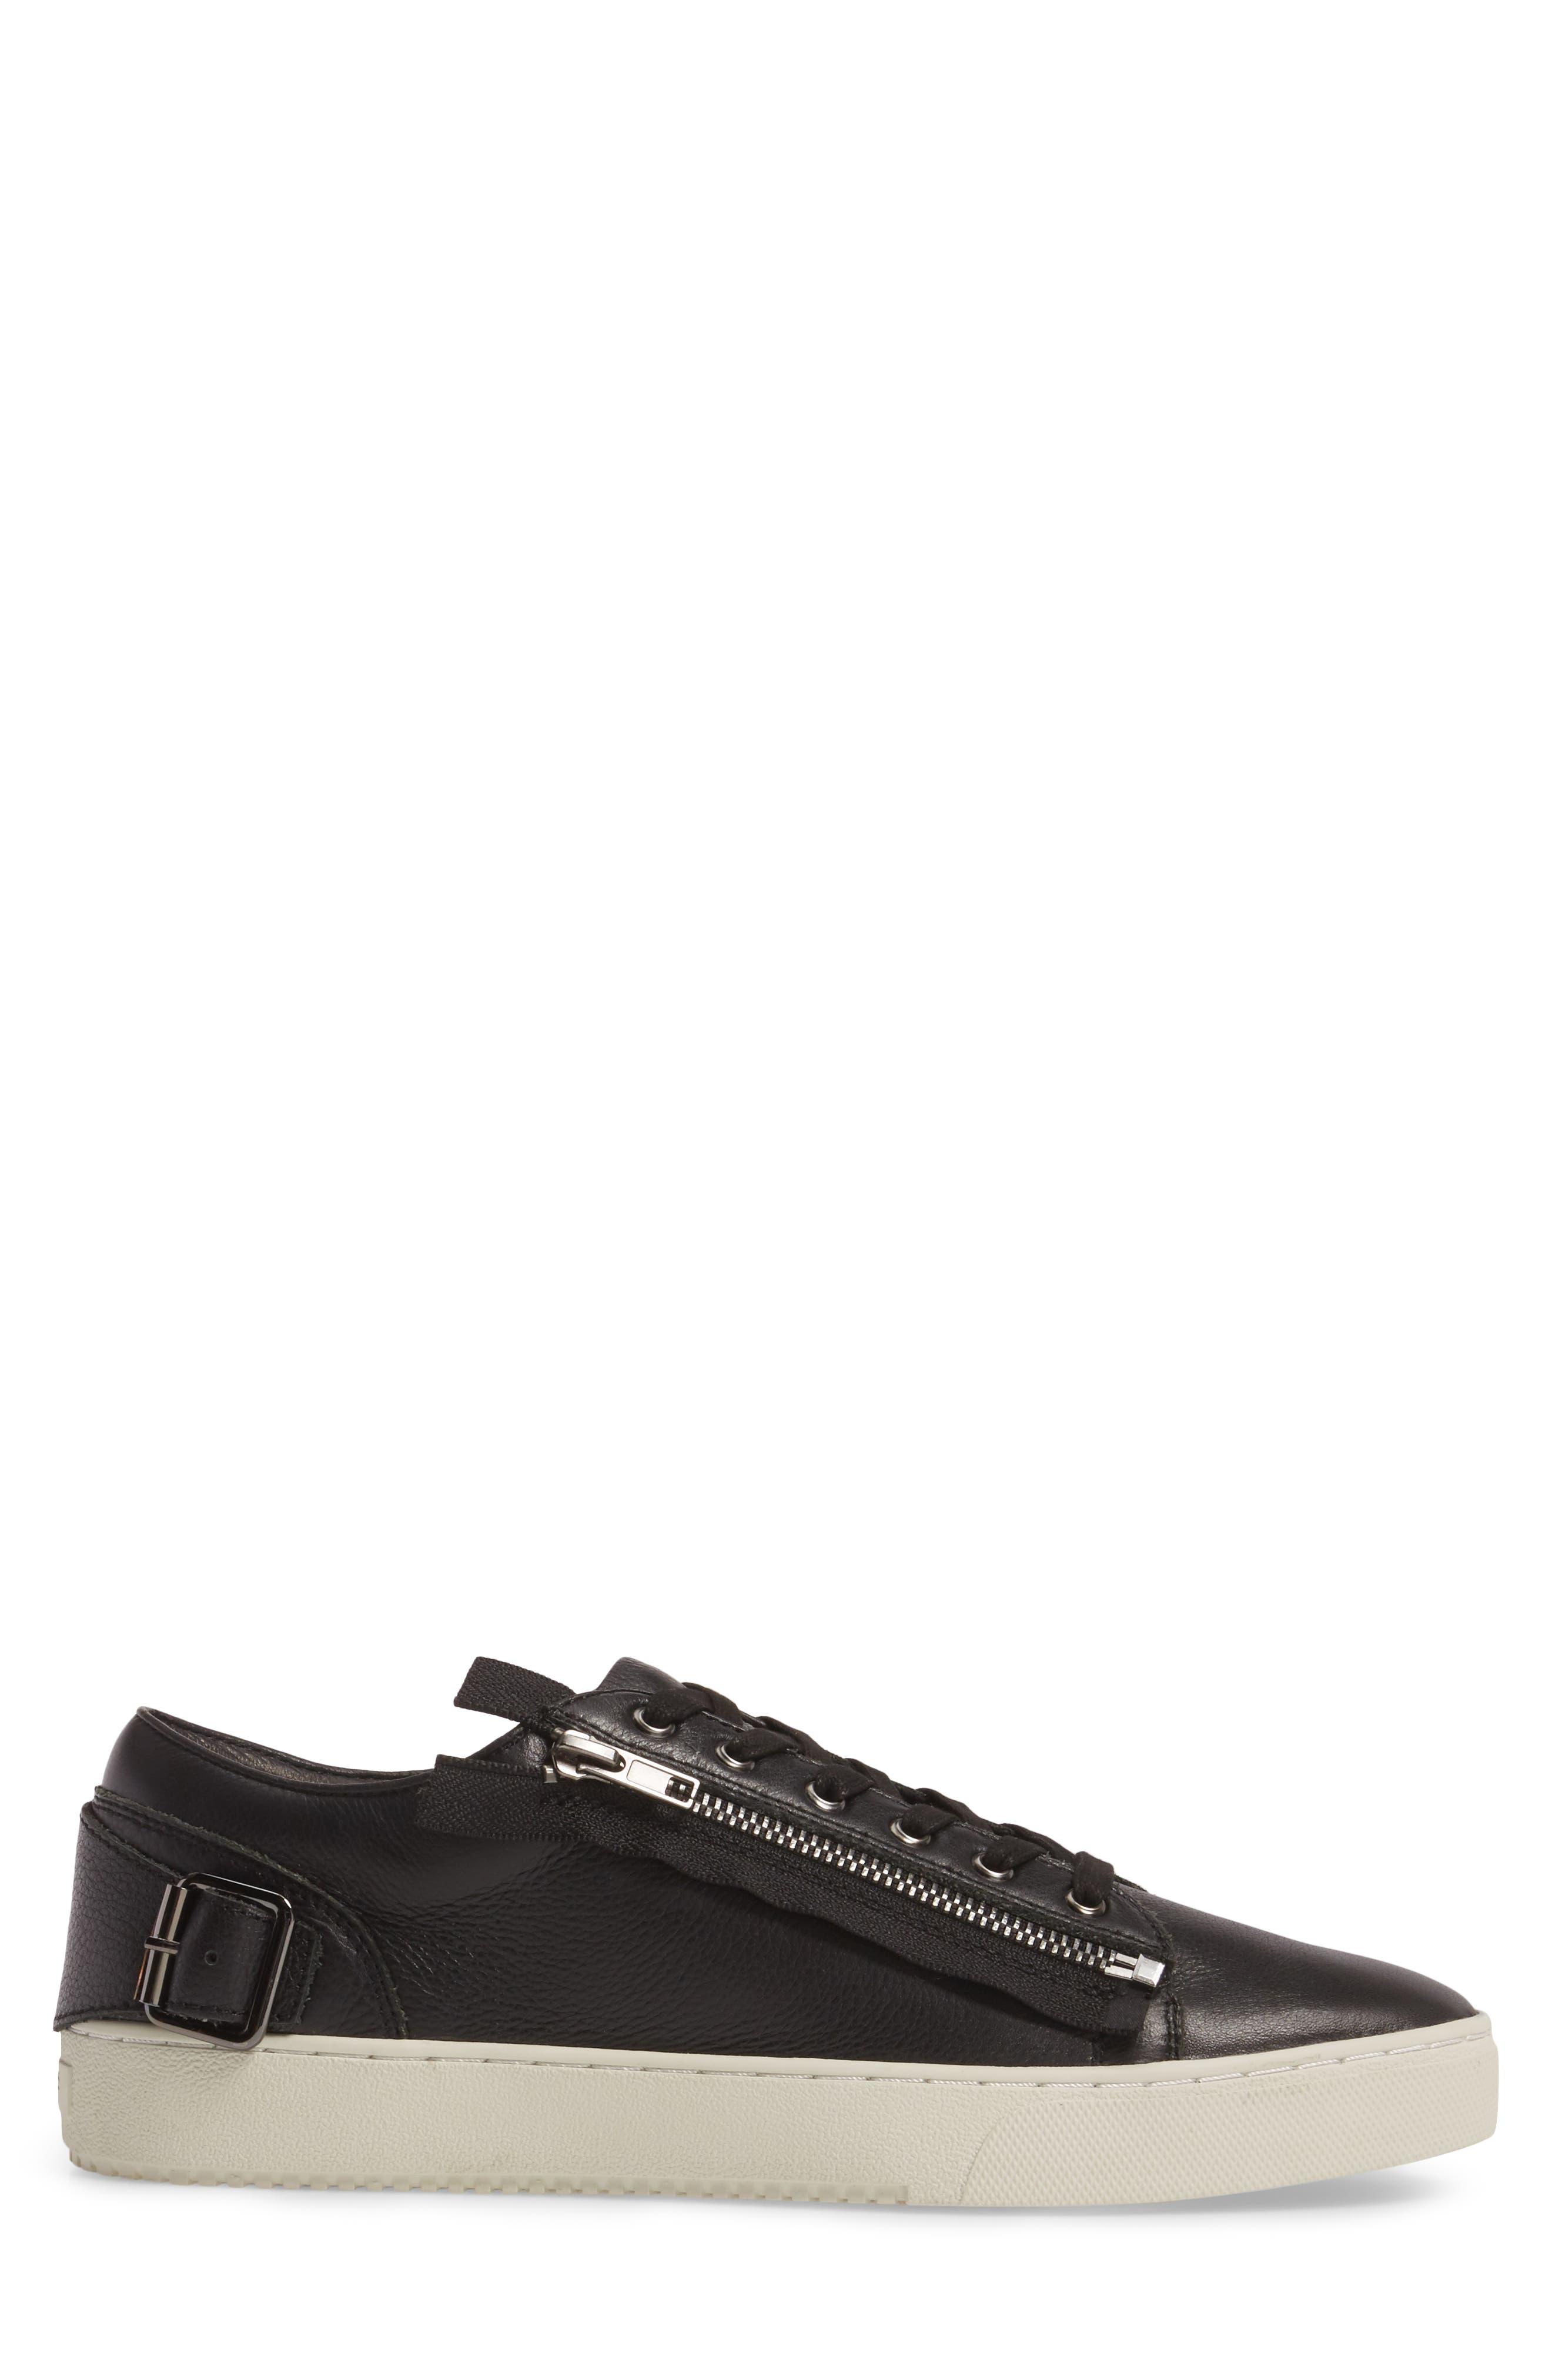 Wayne Sneaker,                             Alternate thumbnail 3, color,                             Black Leather